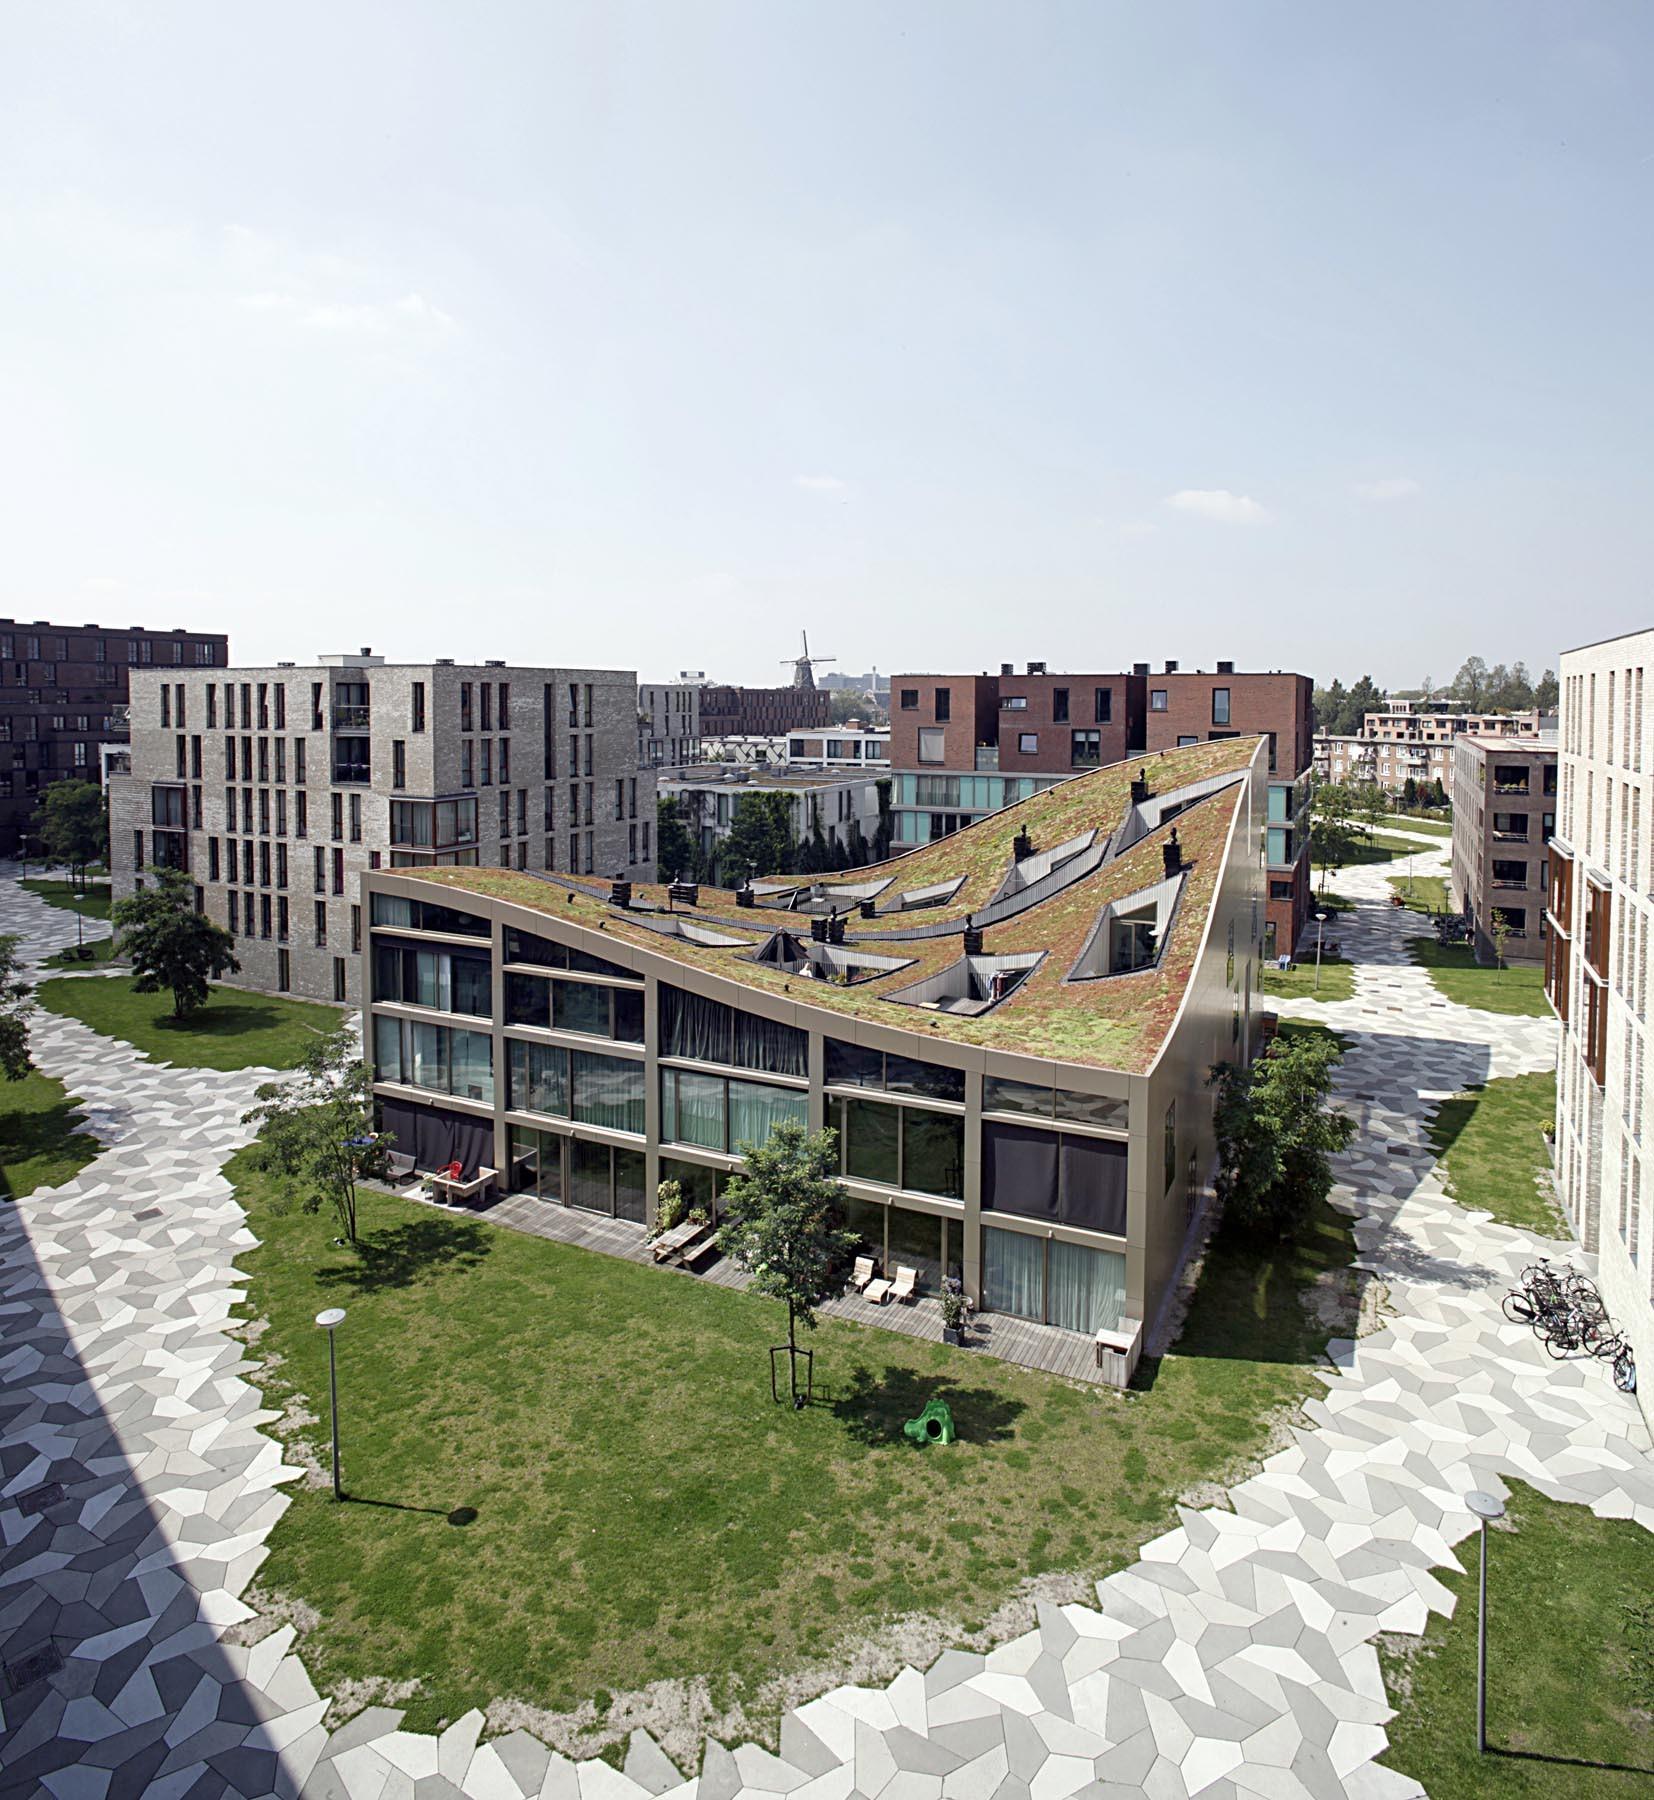 Funen blok k verdana nl architects archdaily for Interieur nederland